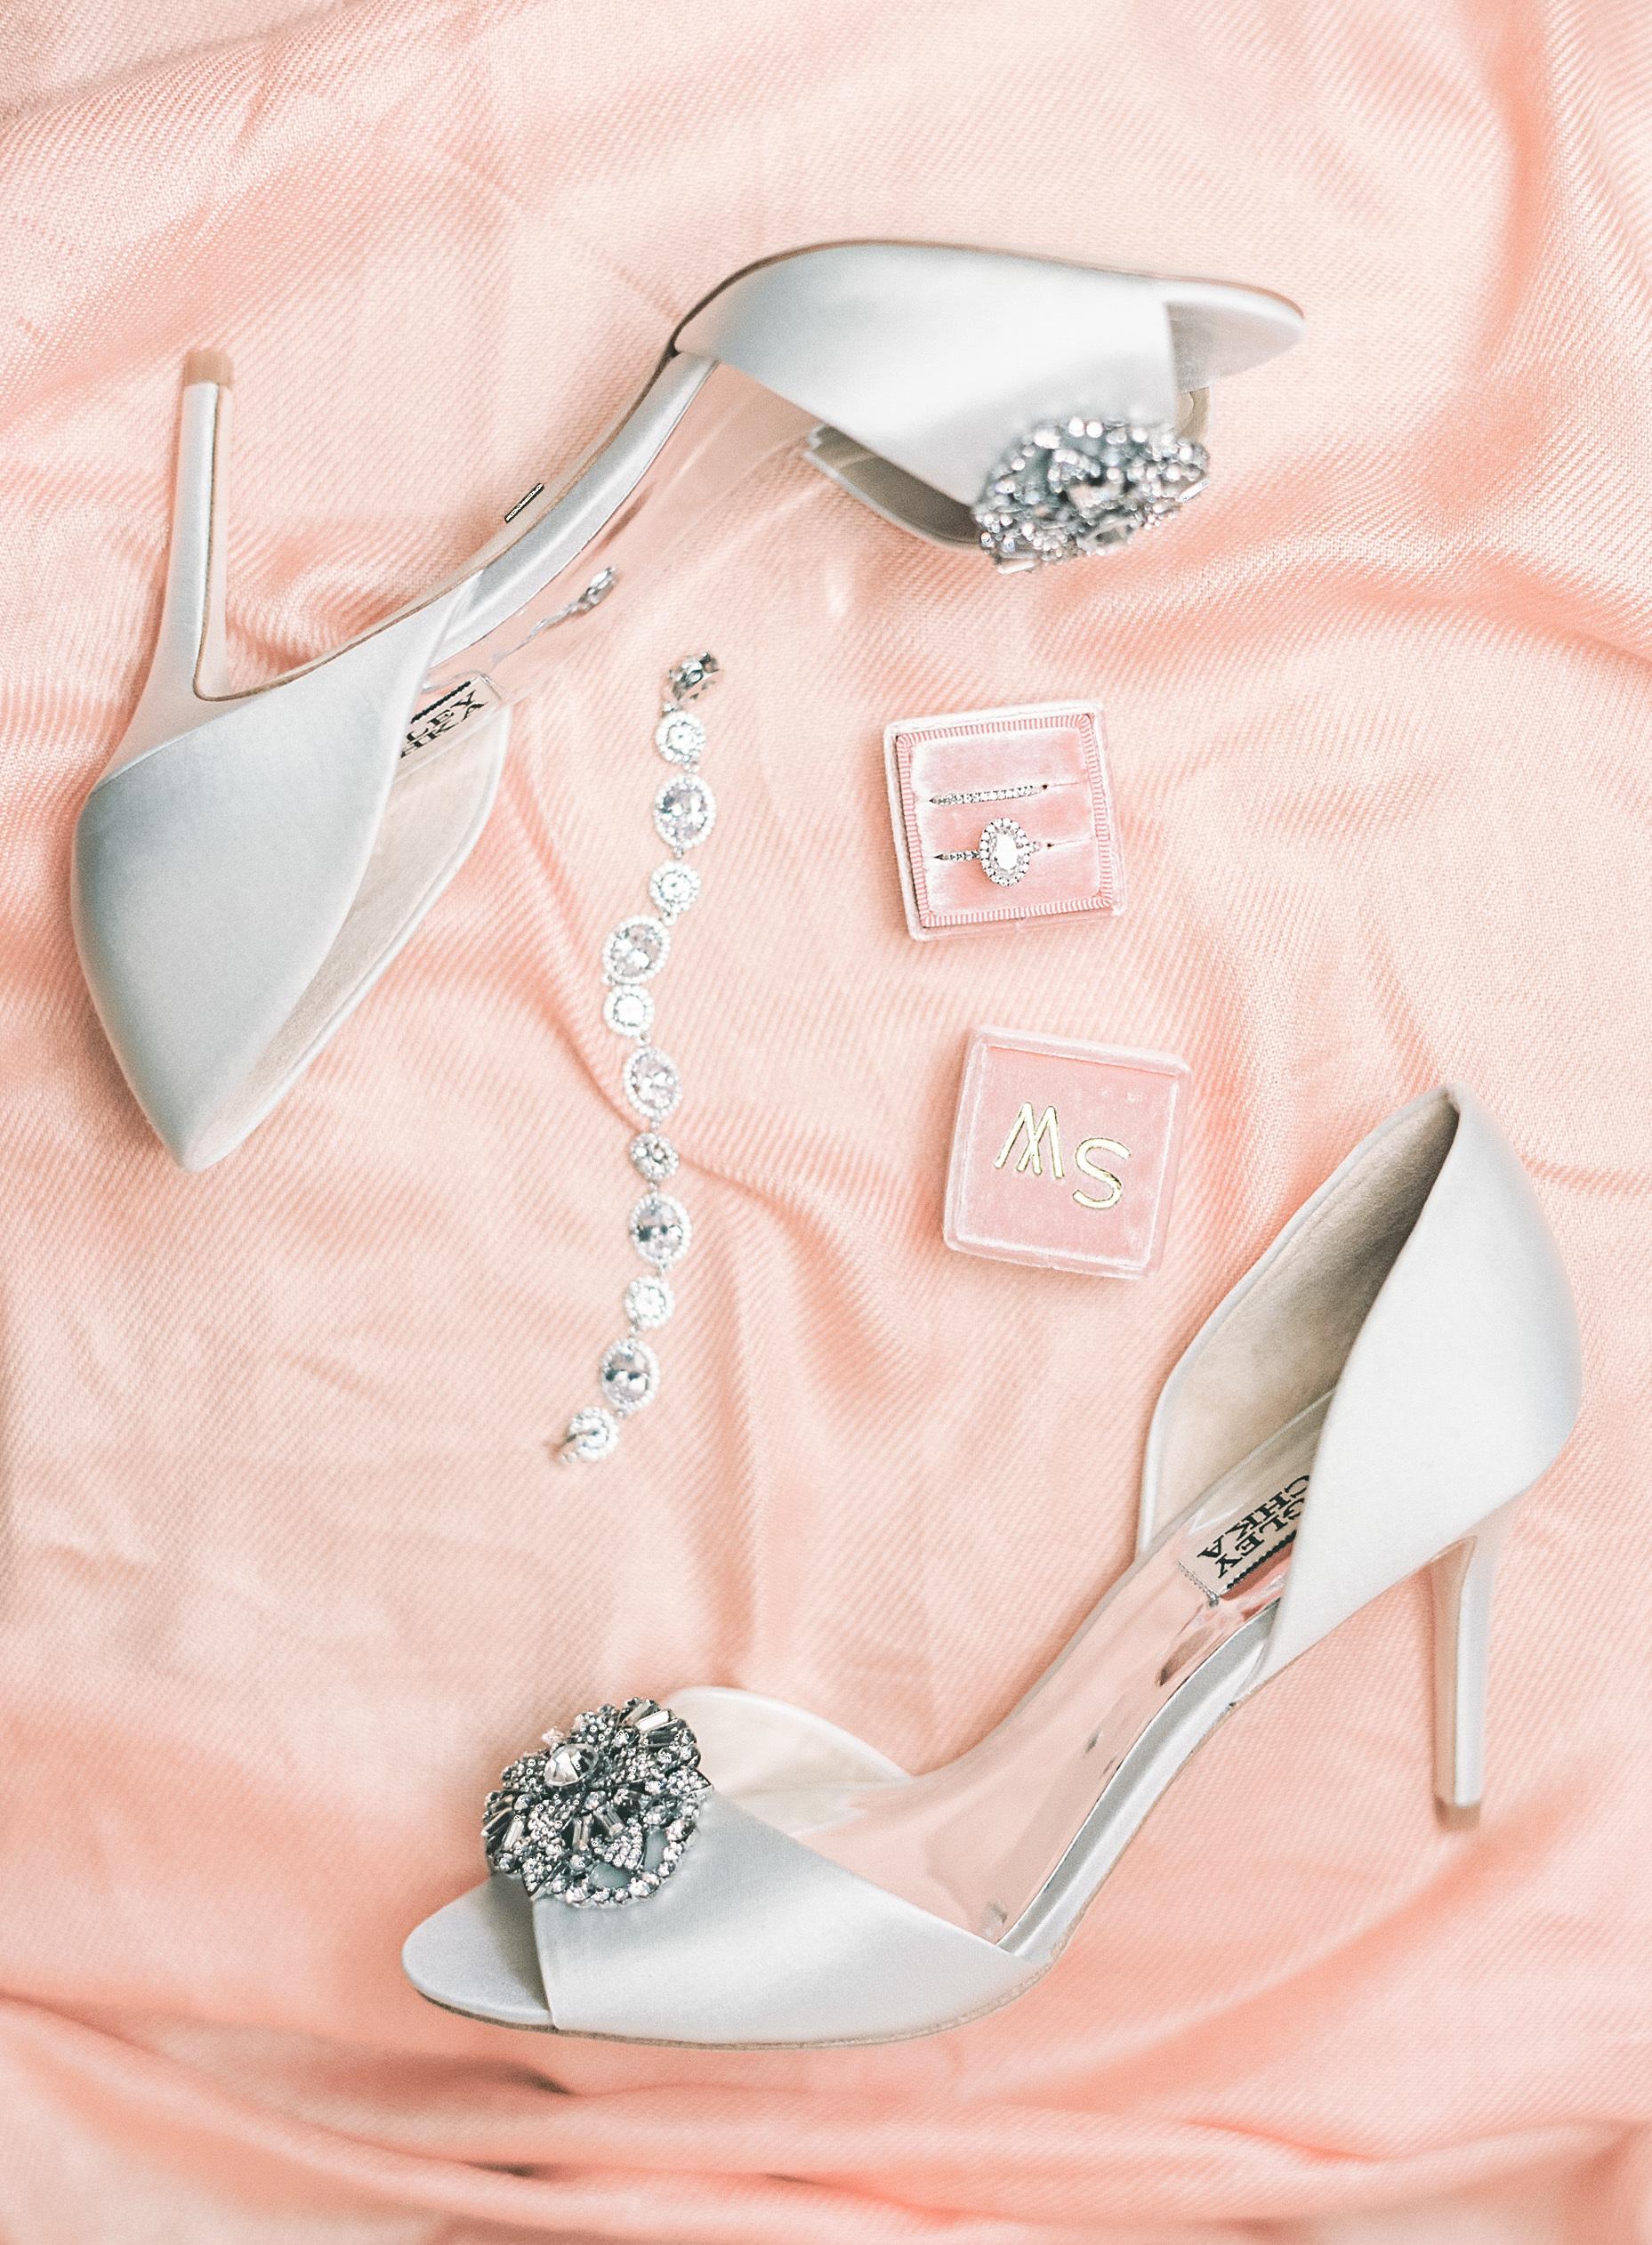 charleston elopement planners, scarlet plan & design, coral, tangerine, hot pink, peach intimate wedding (4).jpg